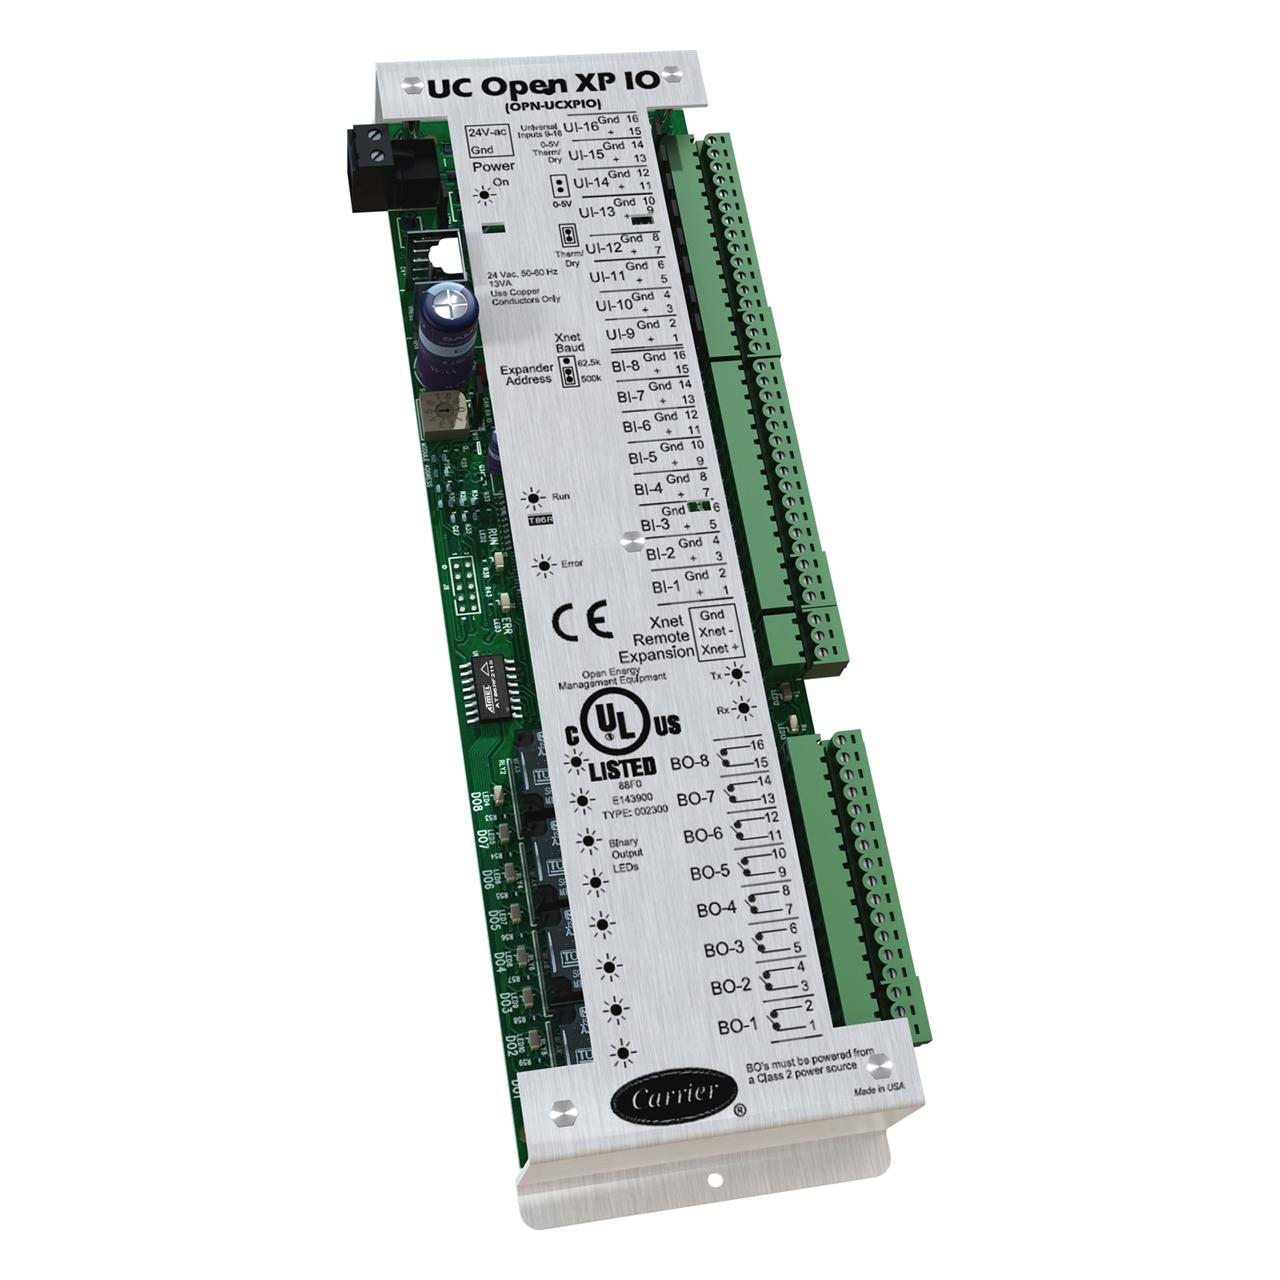 carrier-OPN-UCXPIO-universal-programmable-controller